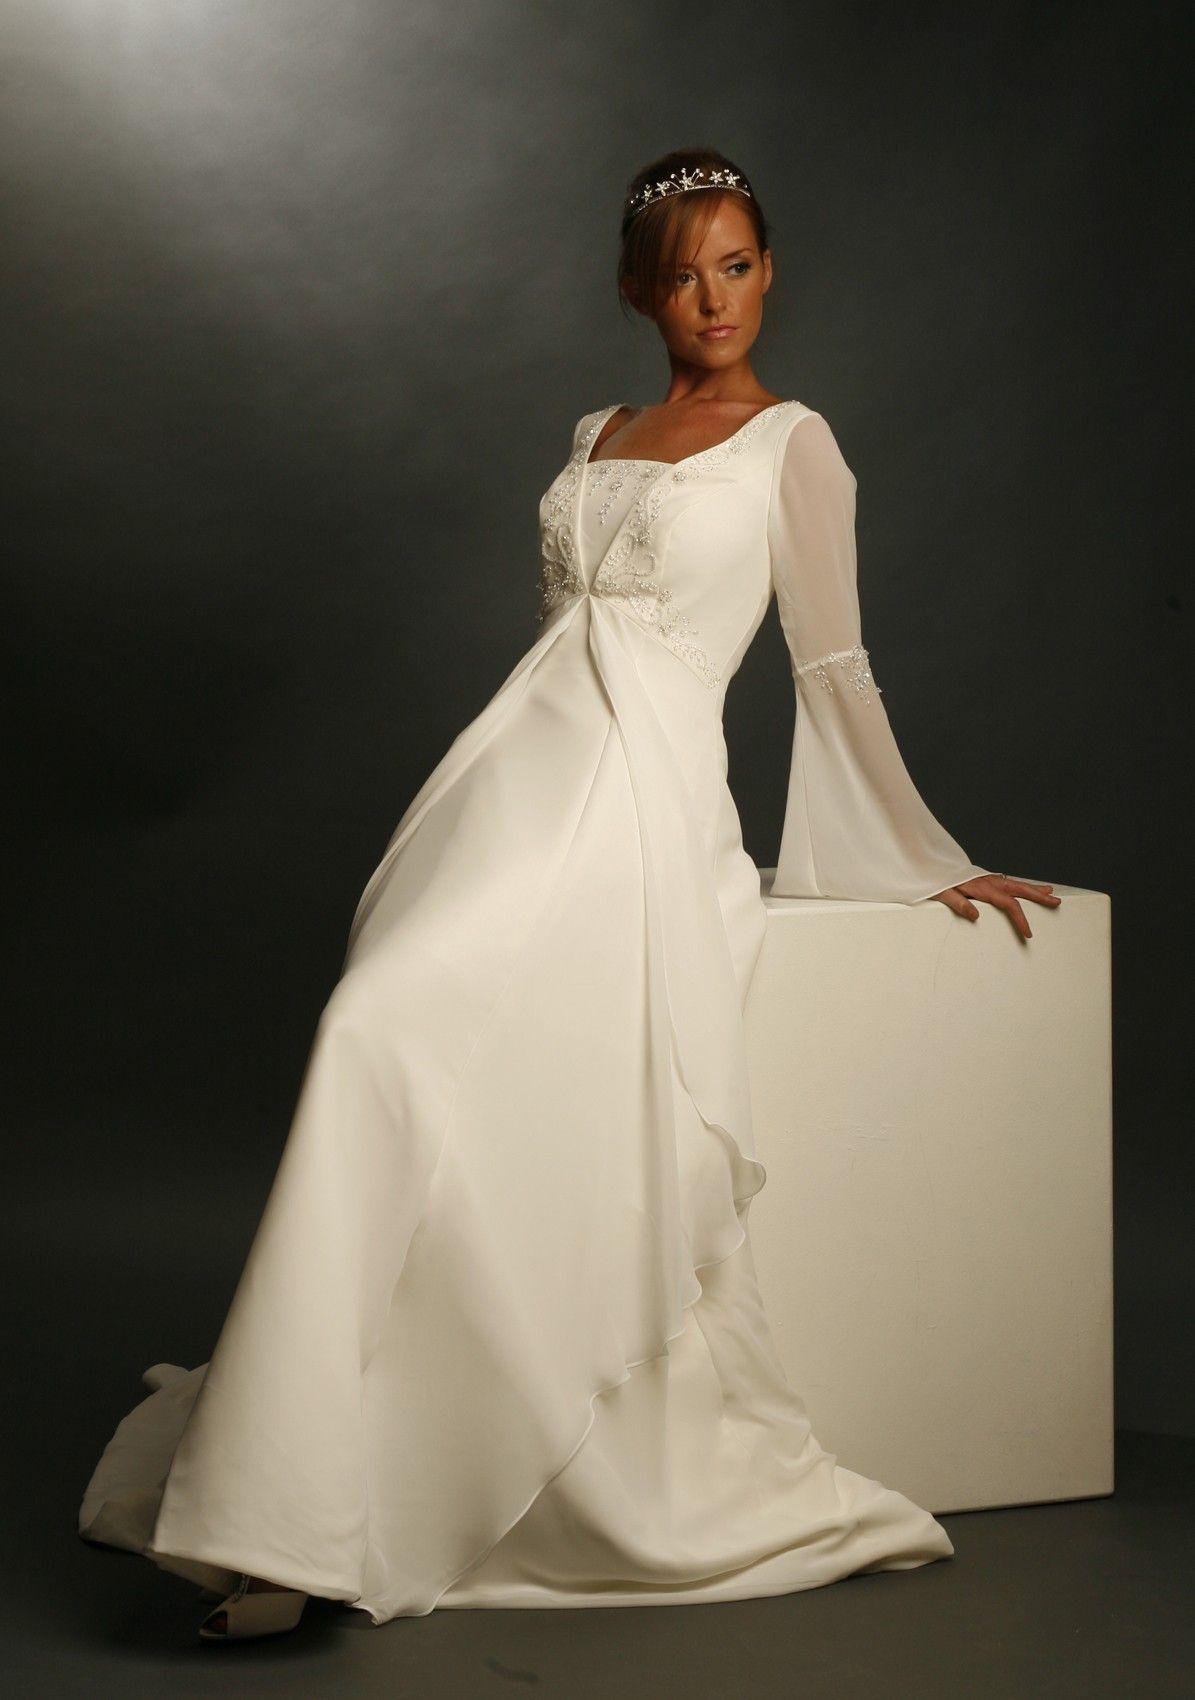 Celtic wedding dresses celtic style long sleeved wedding dress